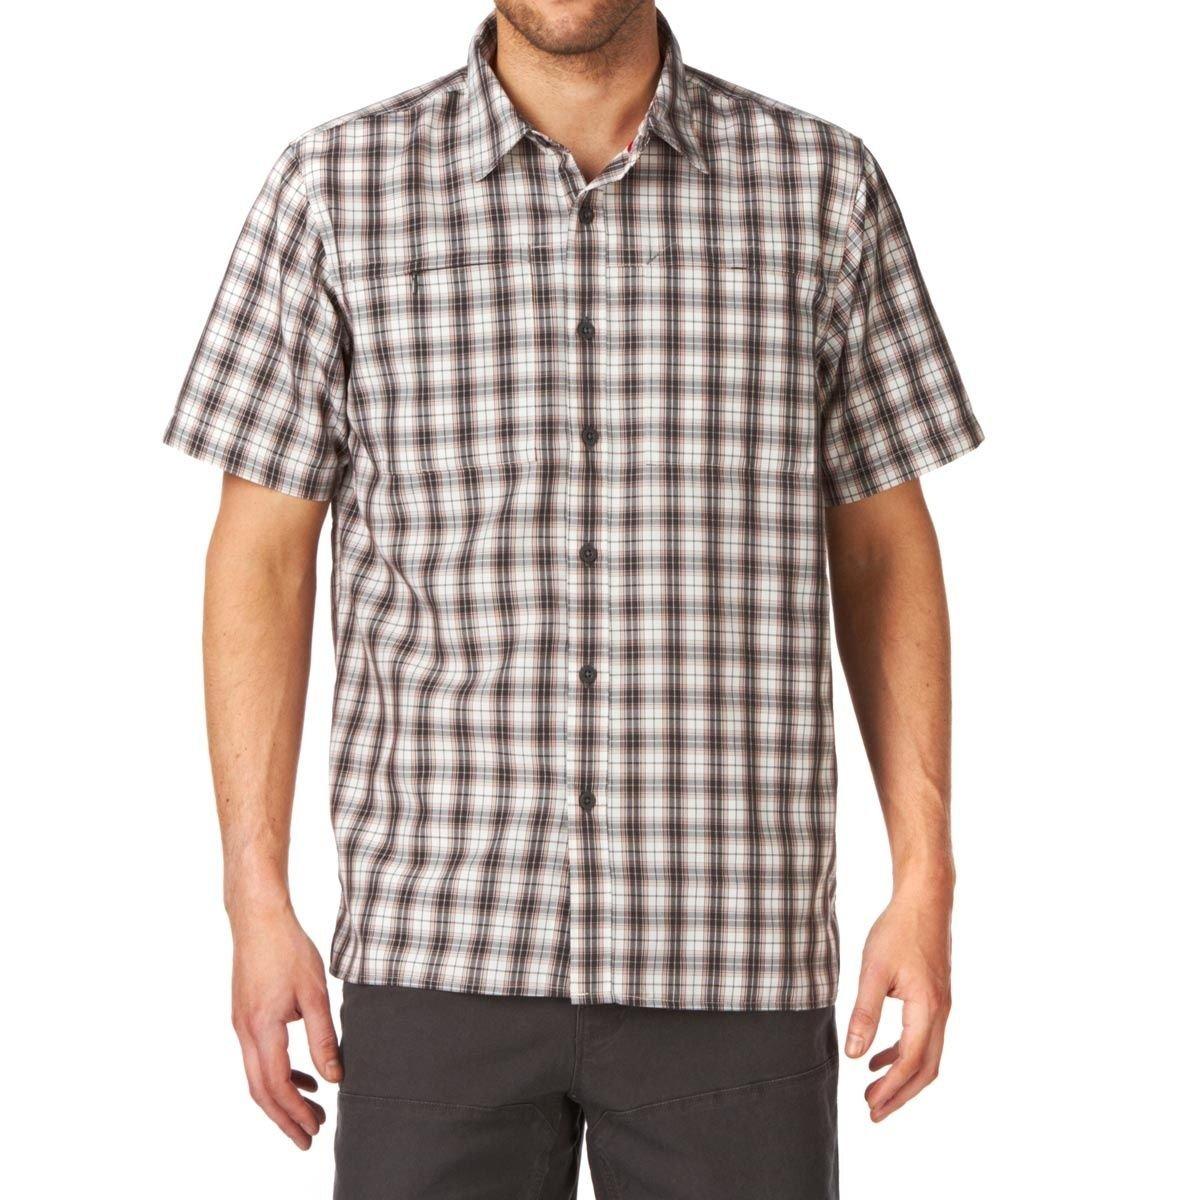 The North Face Hemd 1/2 Men's S/S Millstone Woven asphalt Grau (Größe: L)